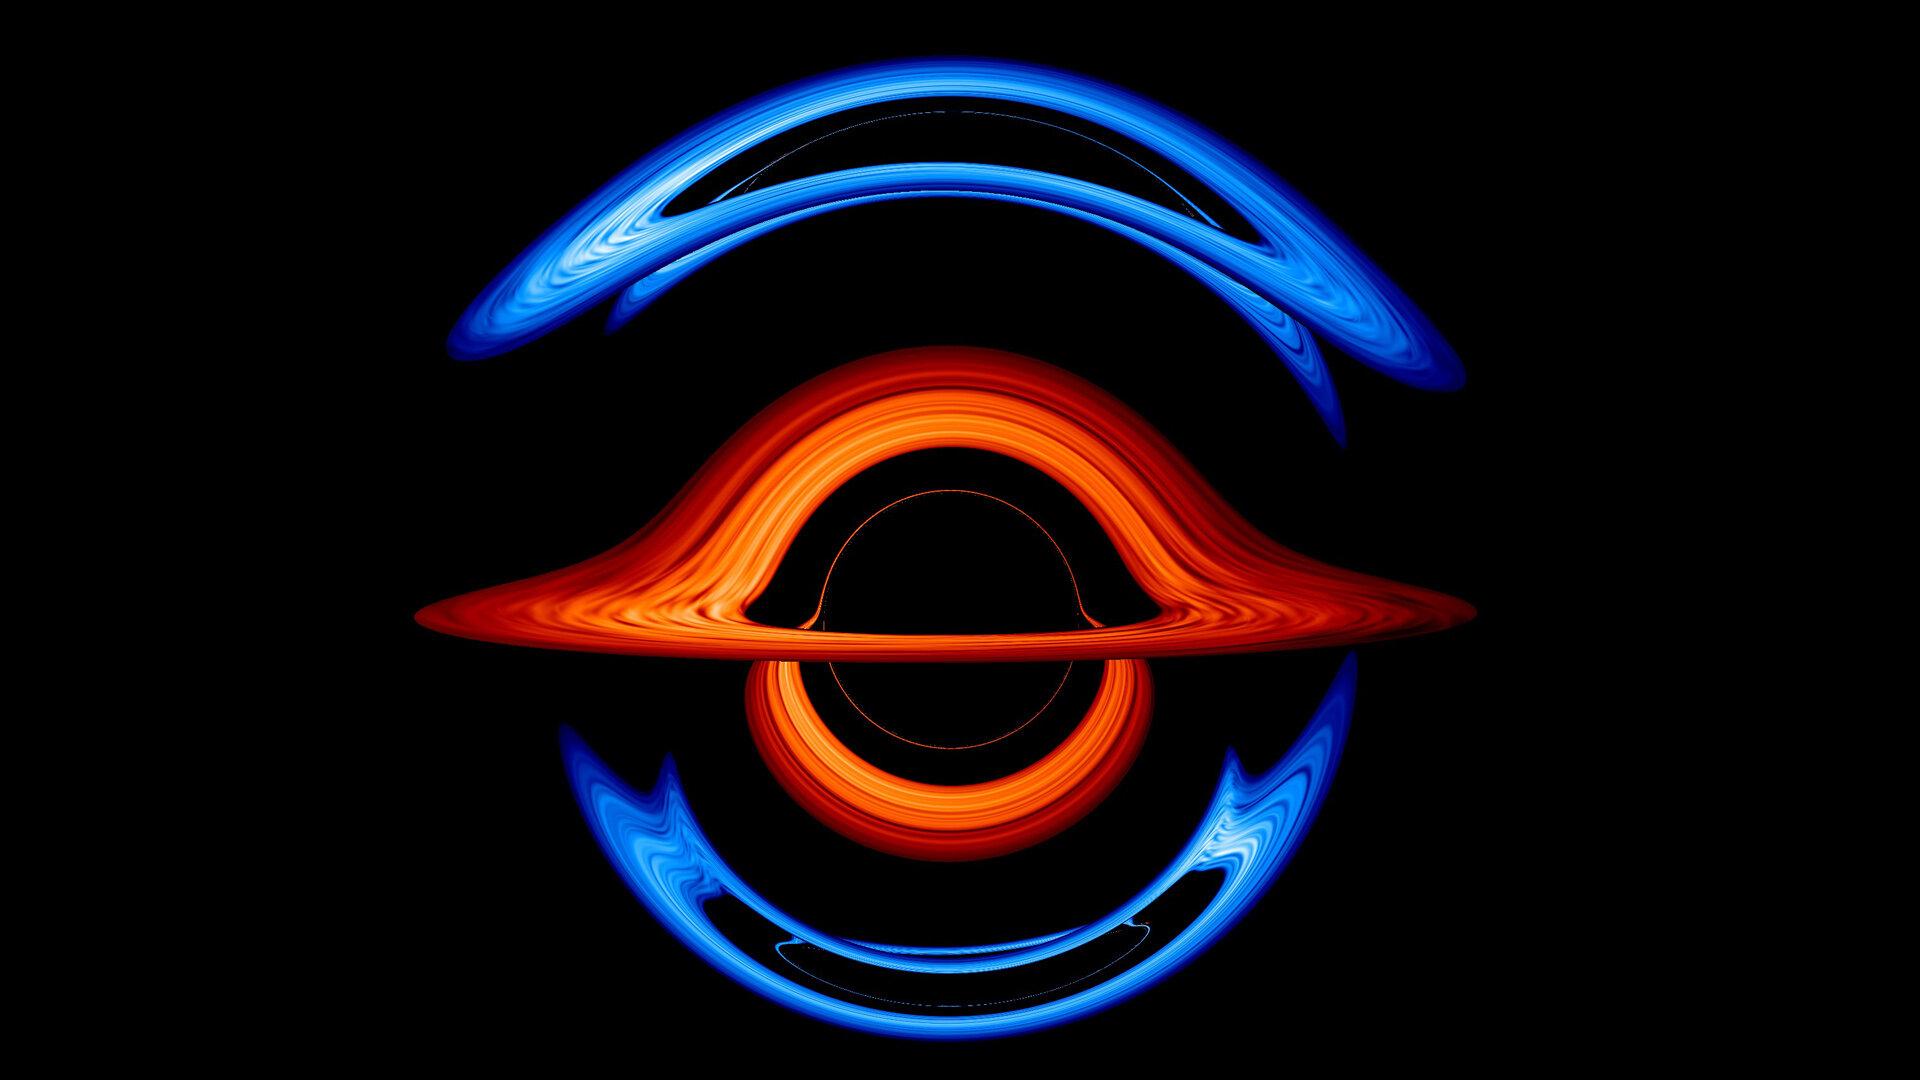 New NASA visualization probes the light-bending dance of binary black holes